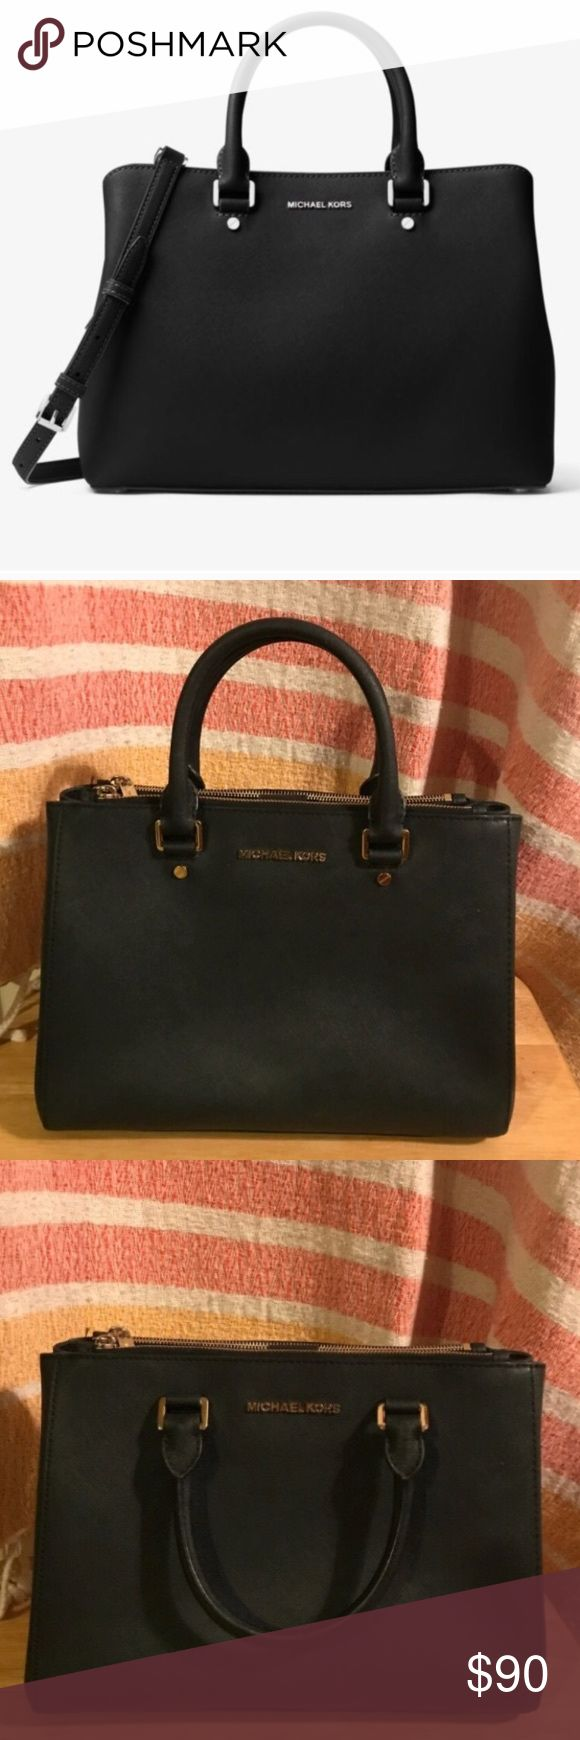 Micheal Kors Handbag gold hardware Lightly worn. Good condition. Gold hardware. Michael Kors Bags Satchels